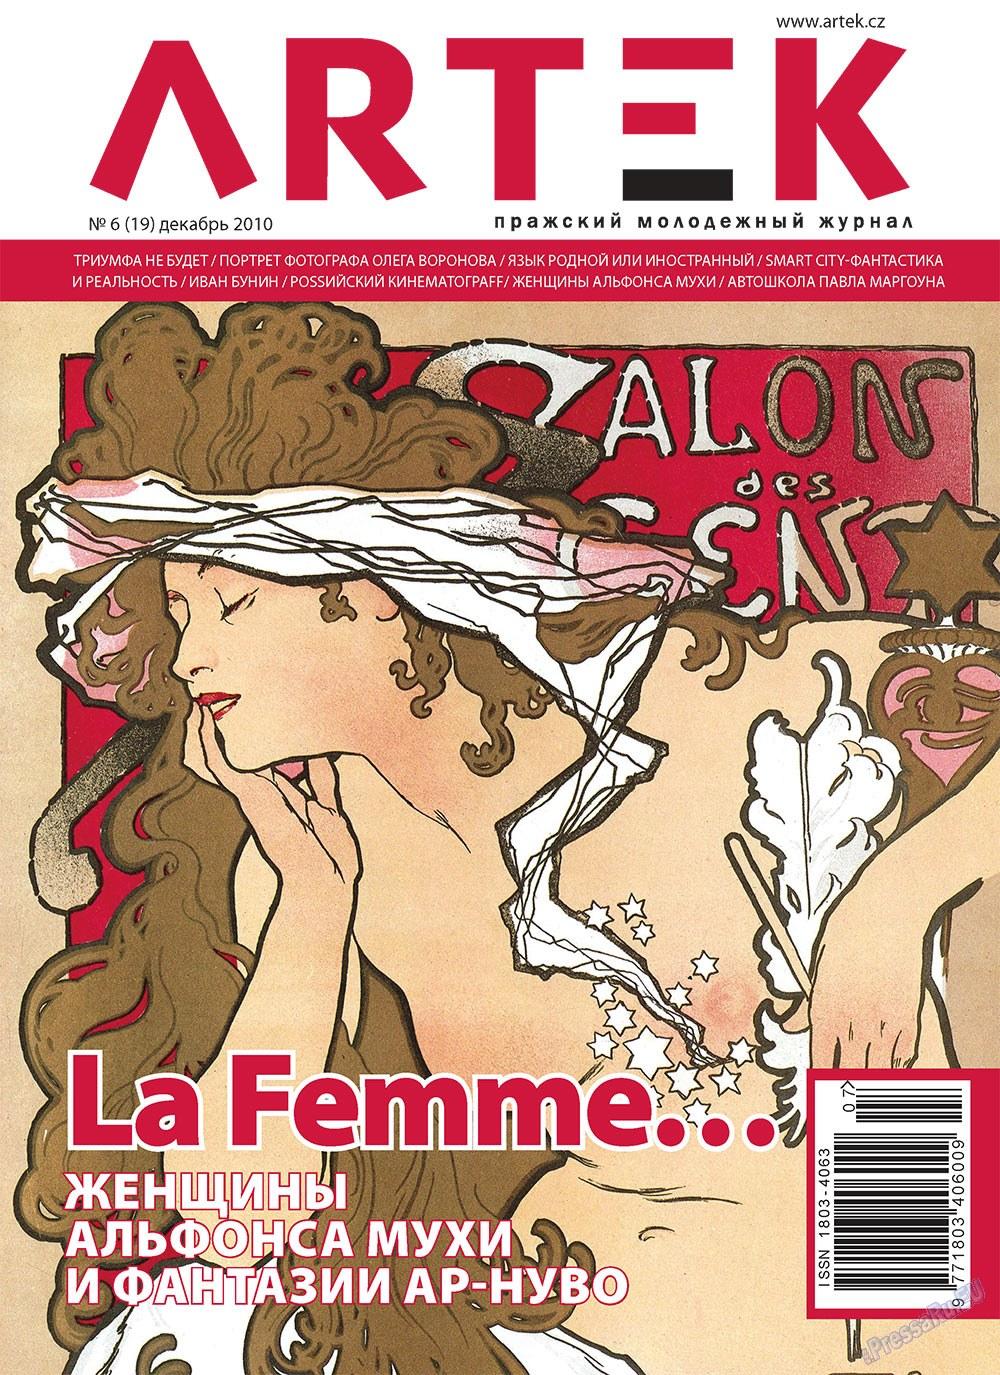 Артек (журнал). 2010 год, номер 6, стр. 1